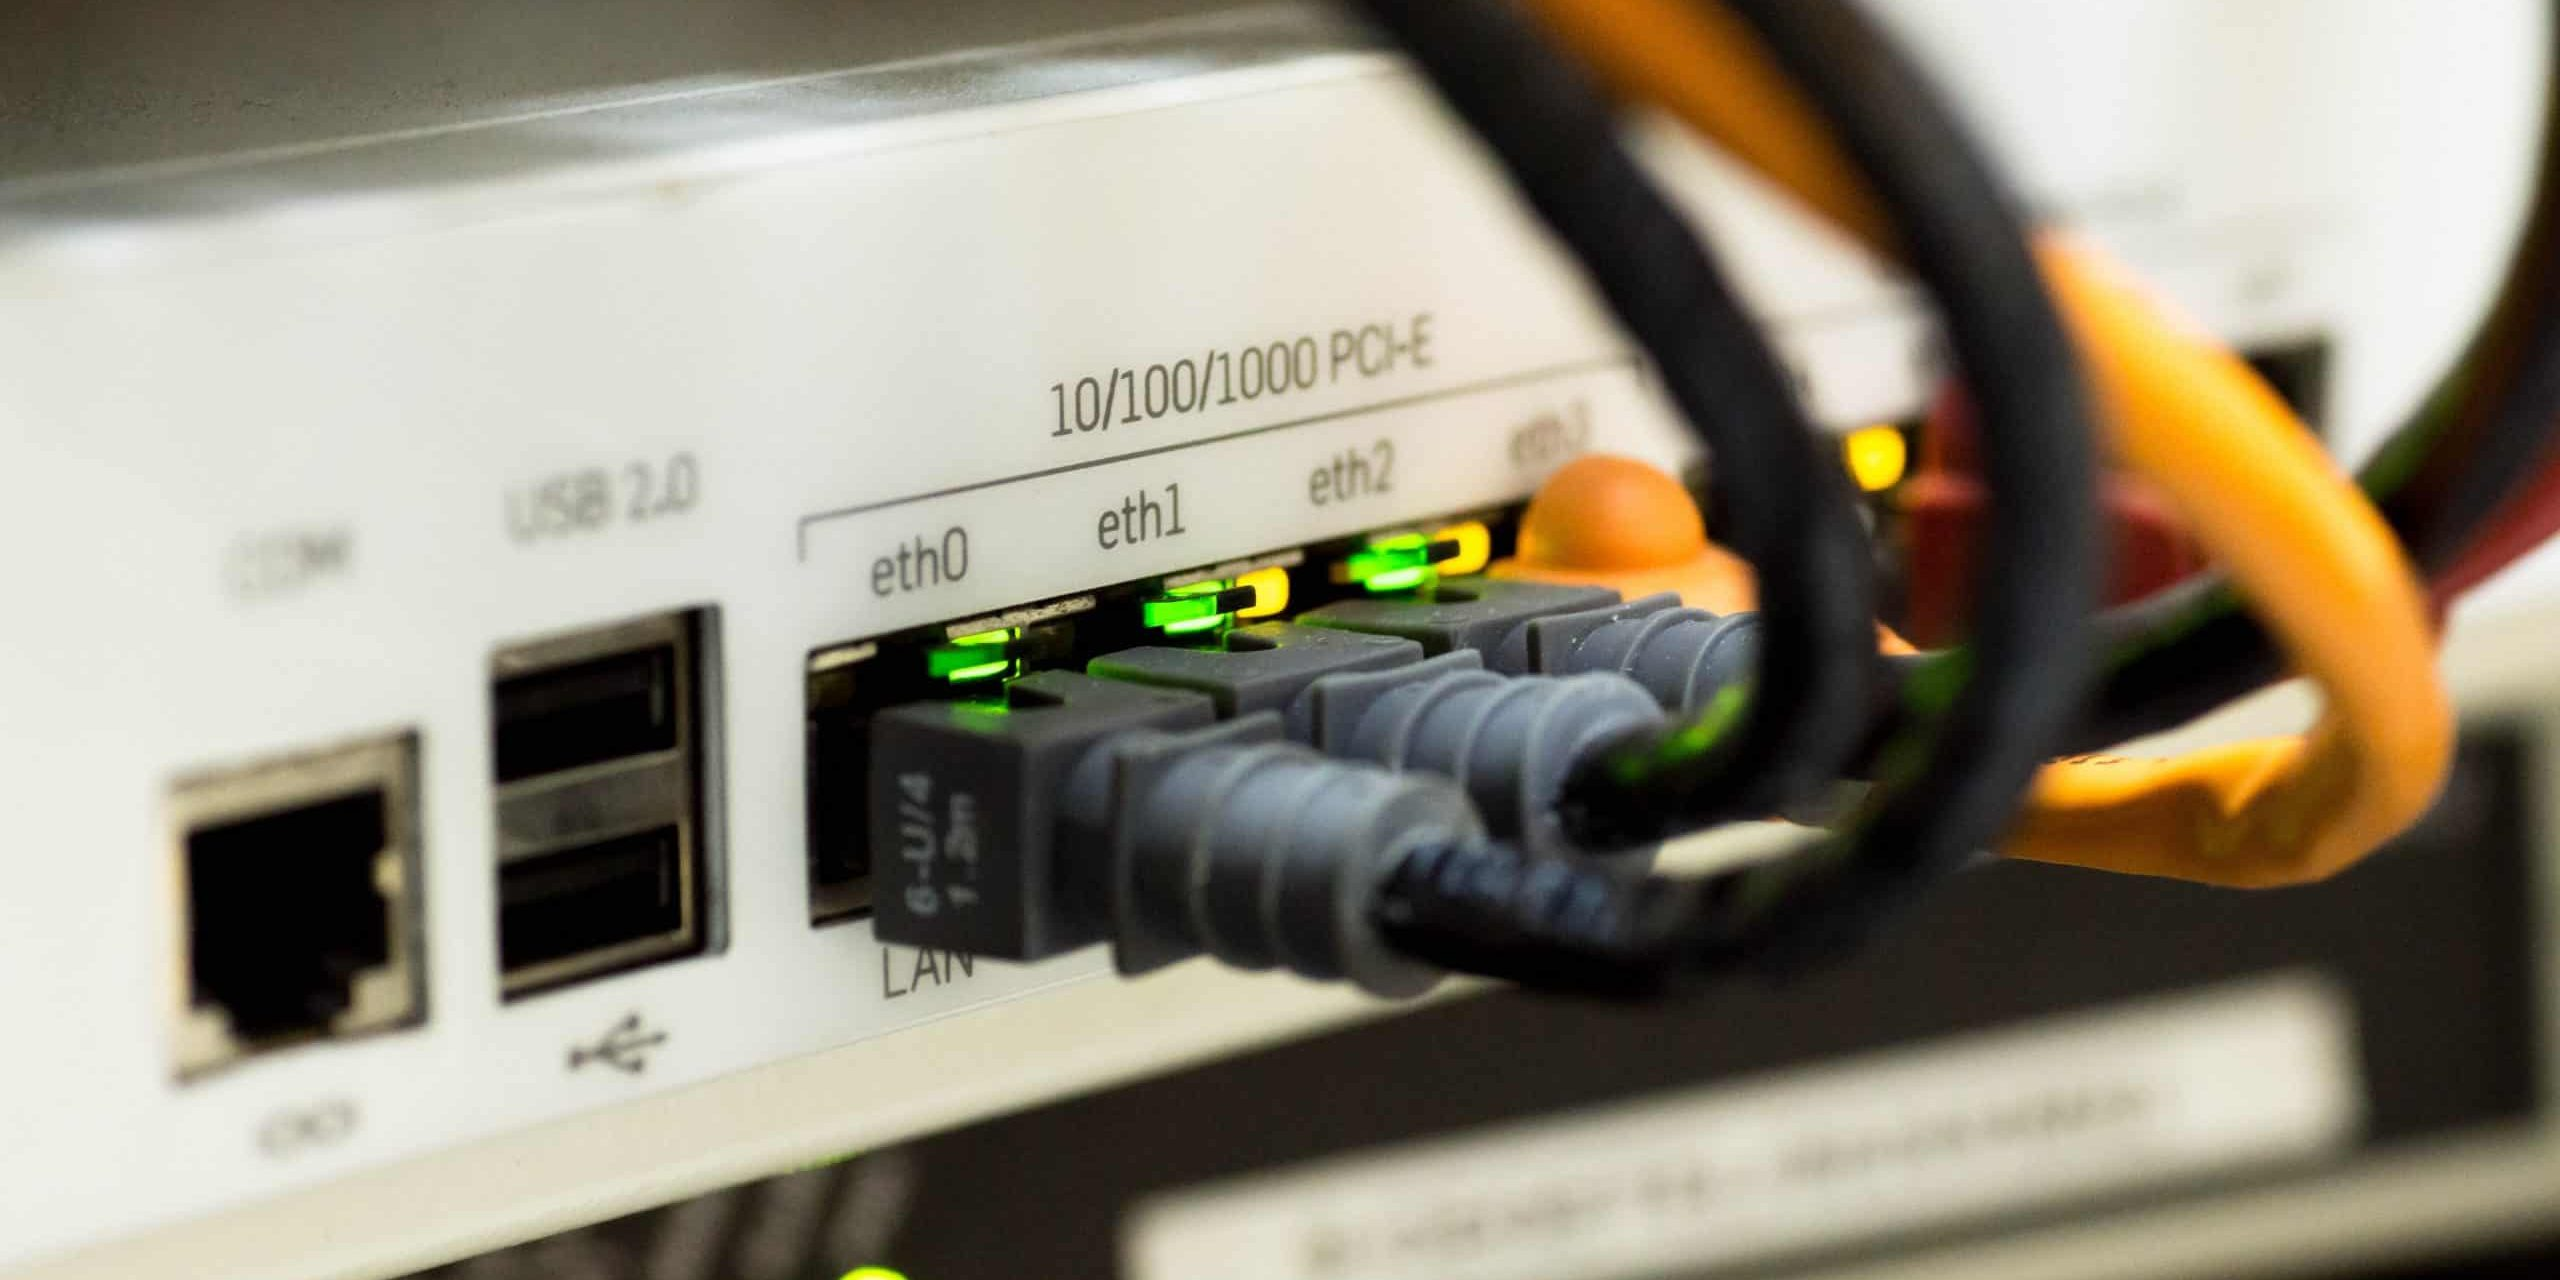 white-switch-hub-turned-on-159304